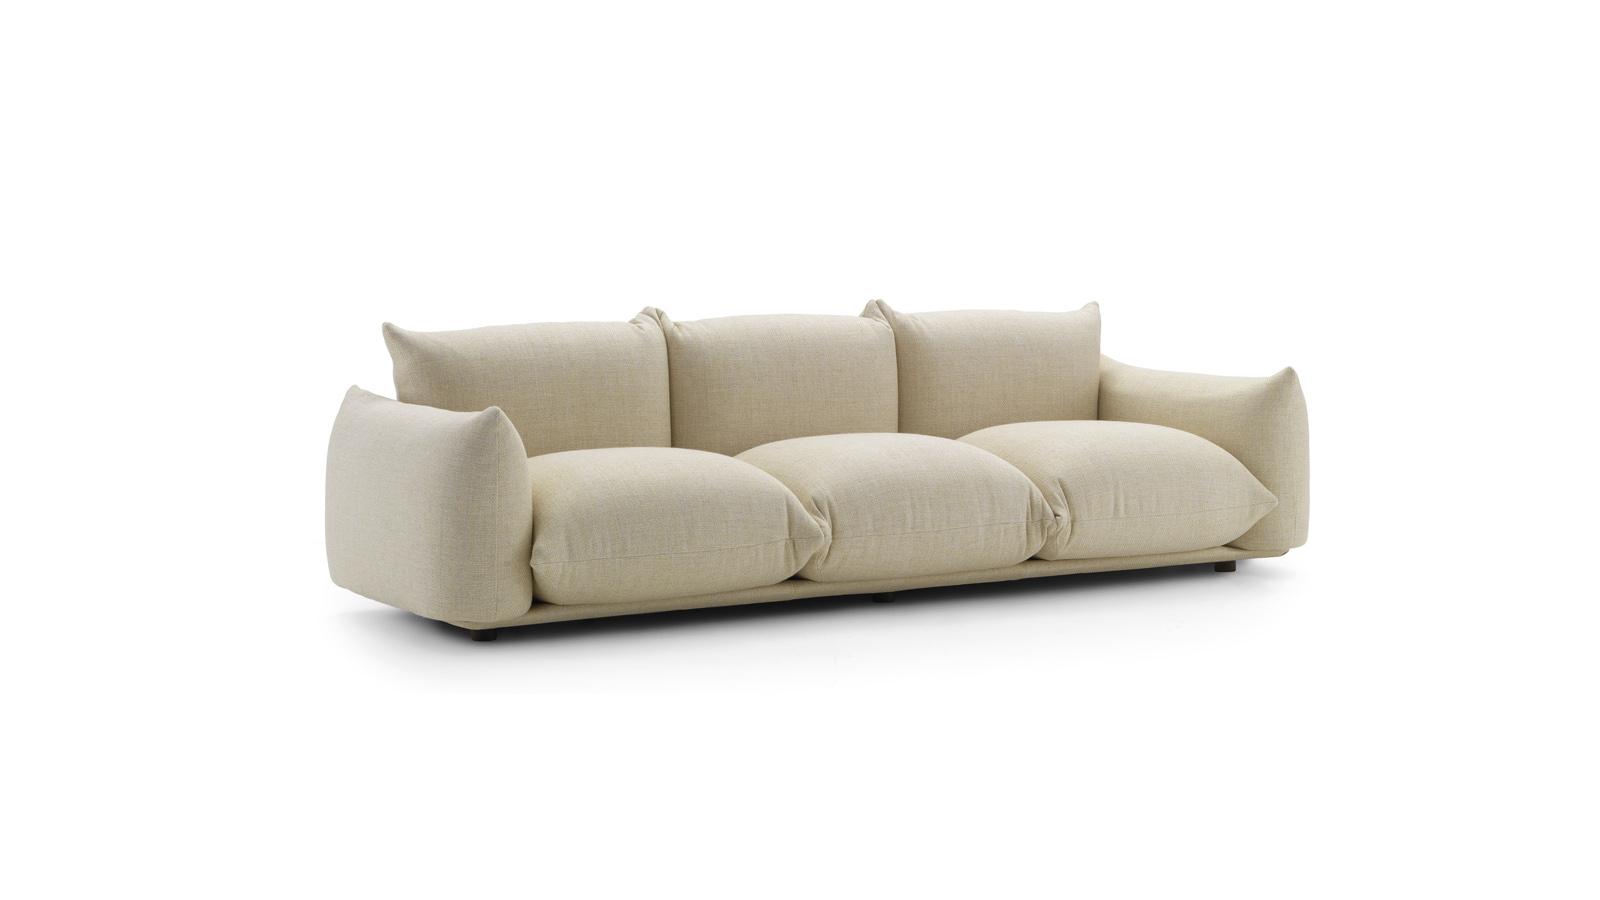 TinnappelMetz-arflex-marenco-sofa-02